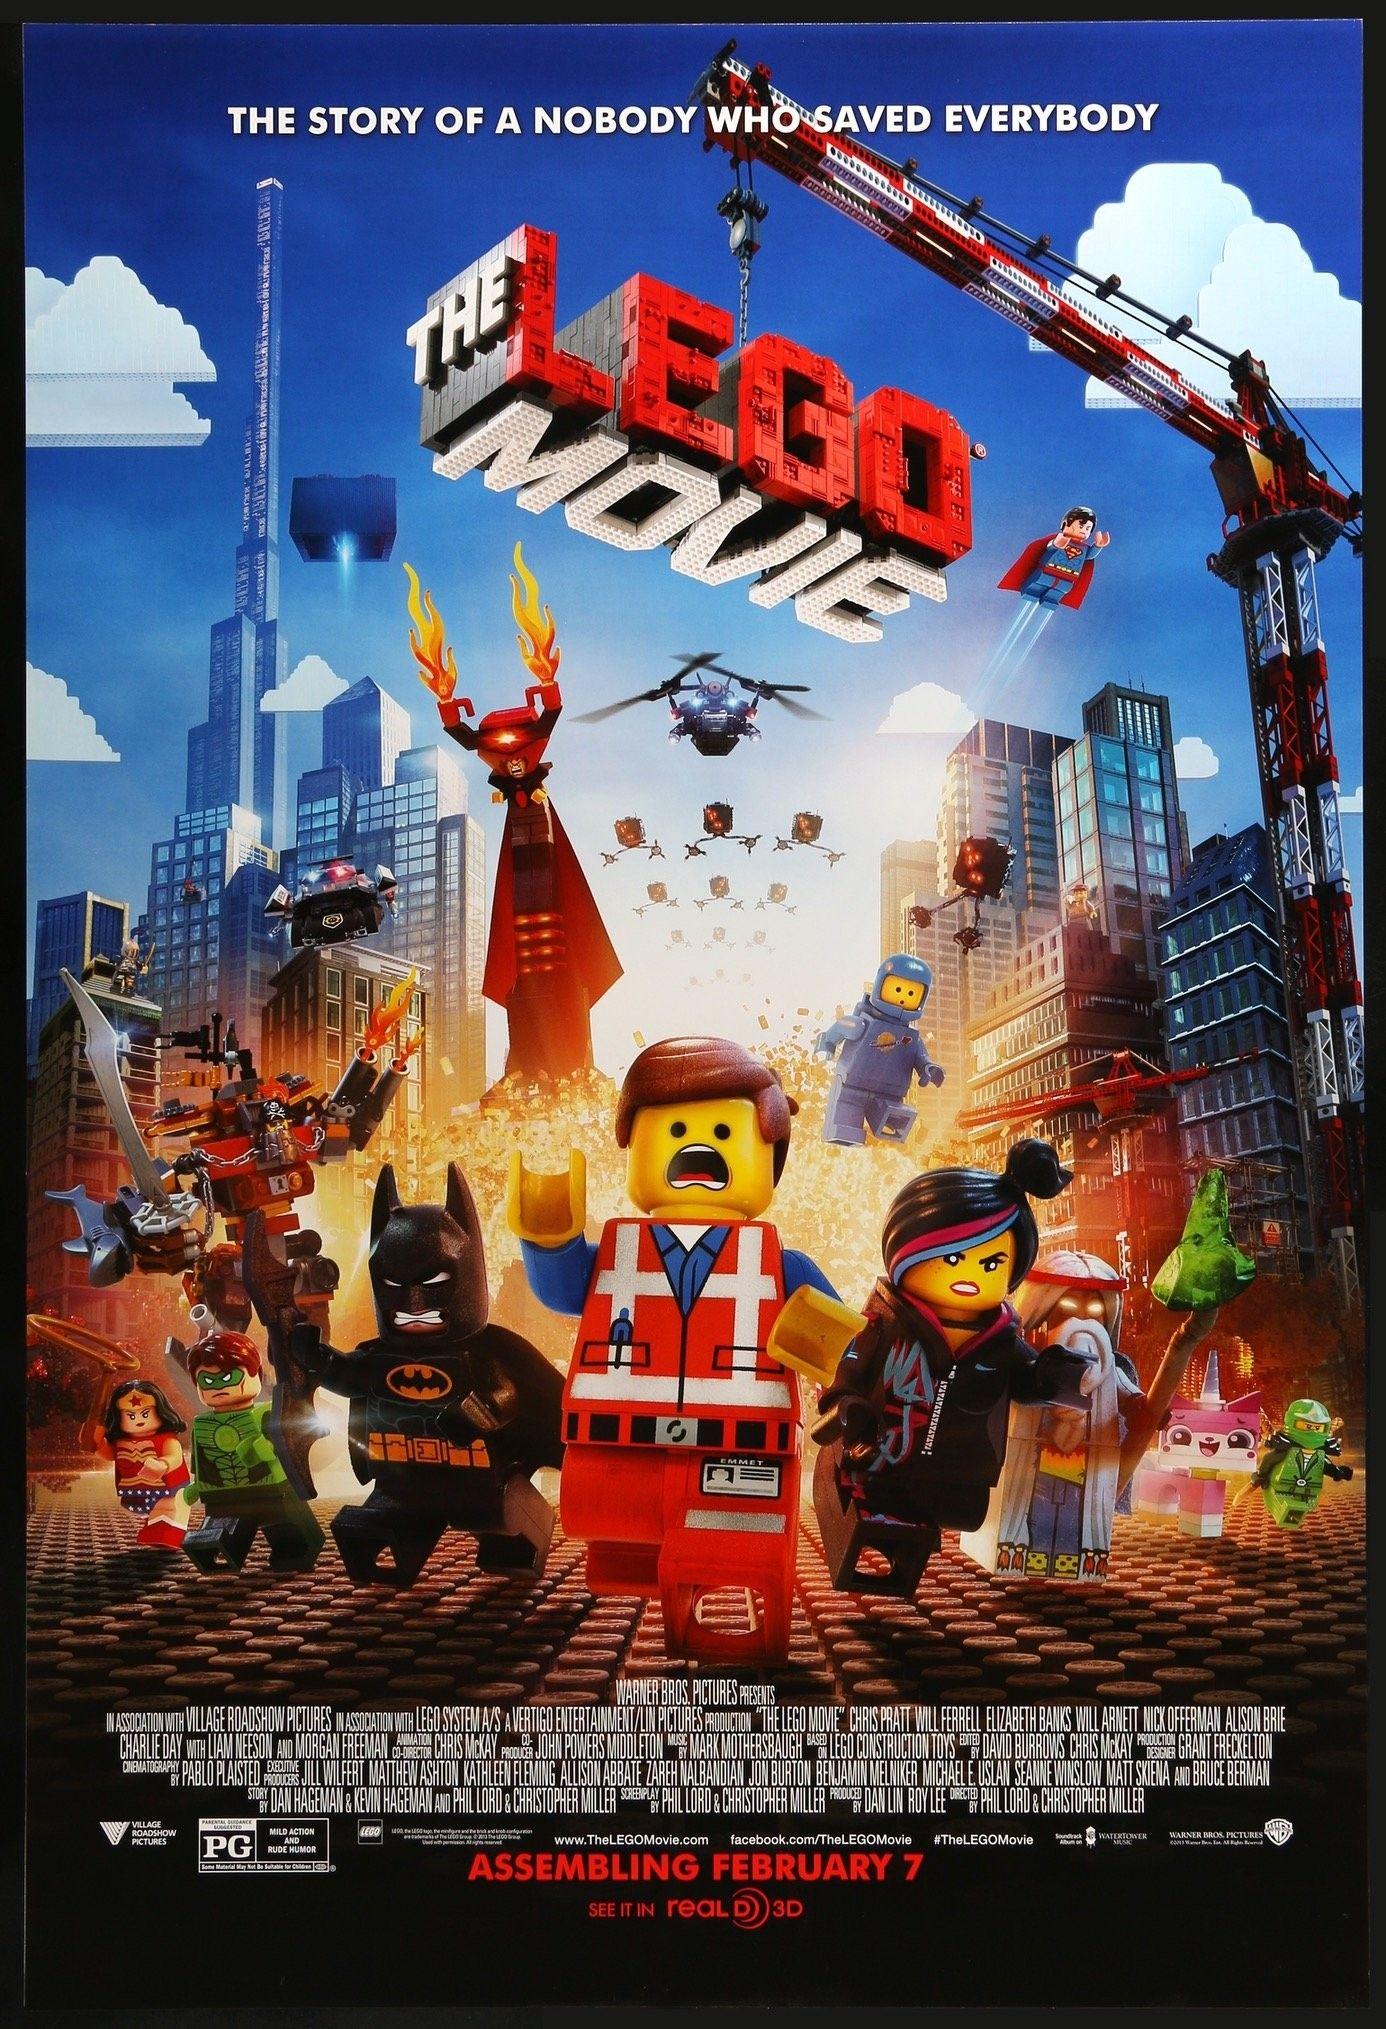 The Lego Movie Lego Movie Movies 2014 Movie Posters